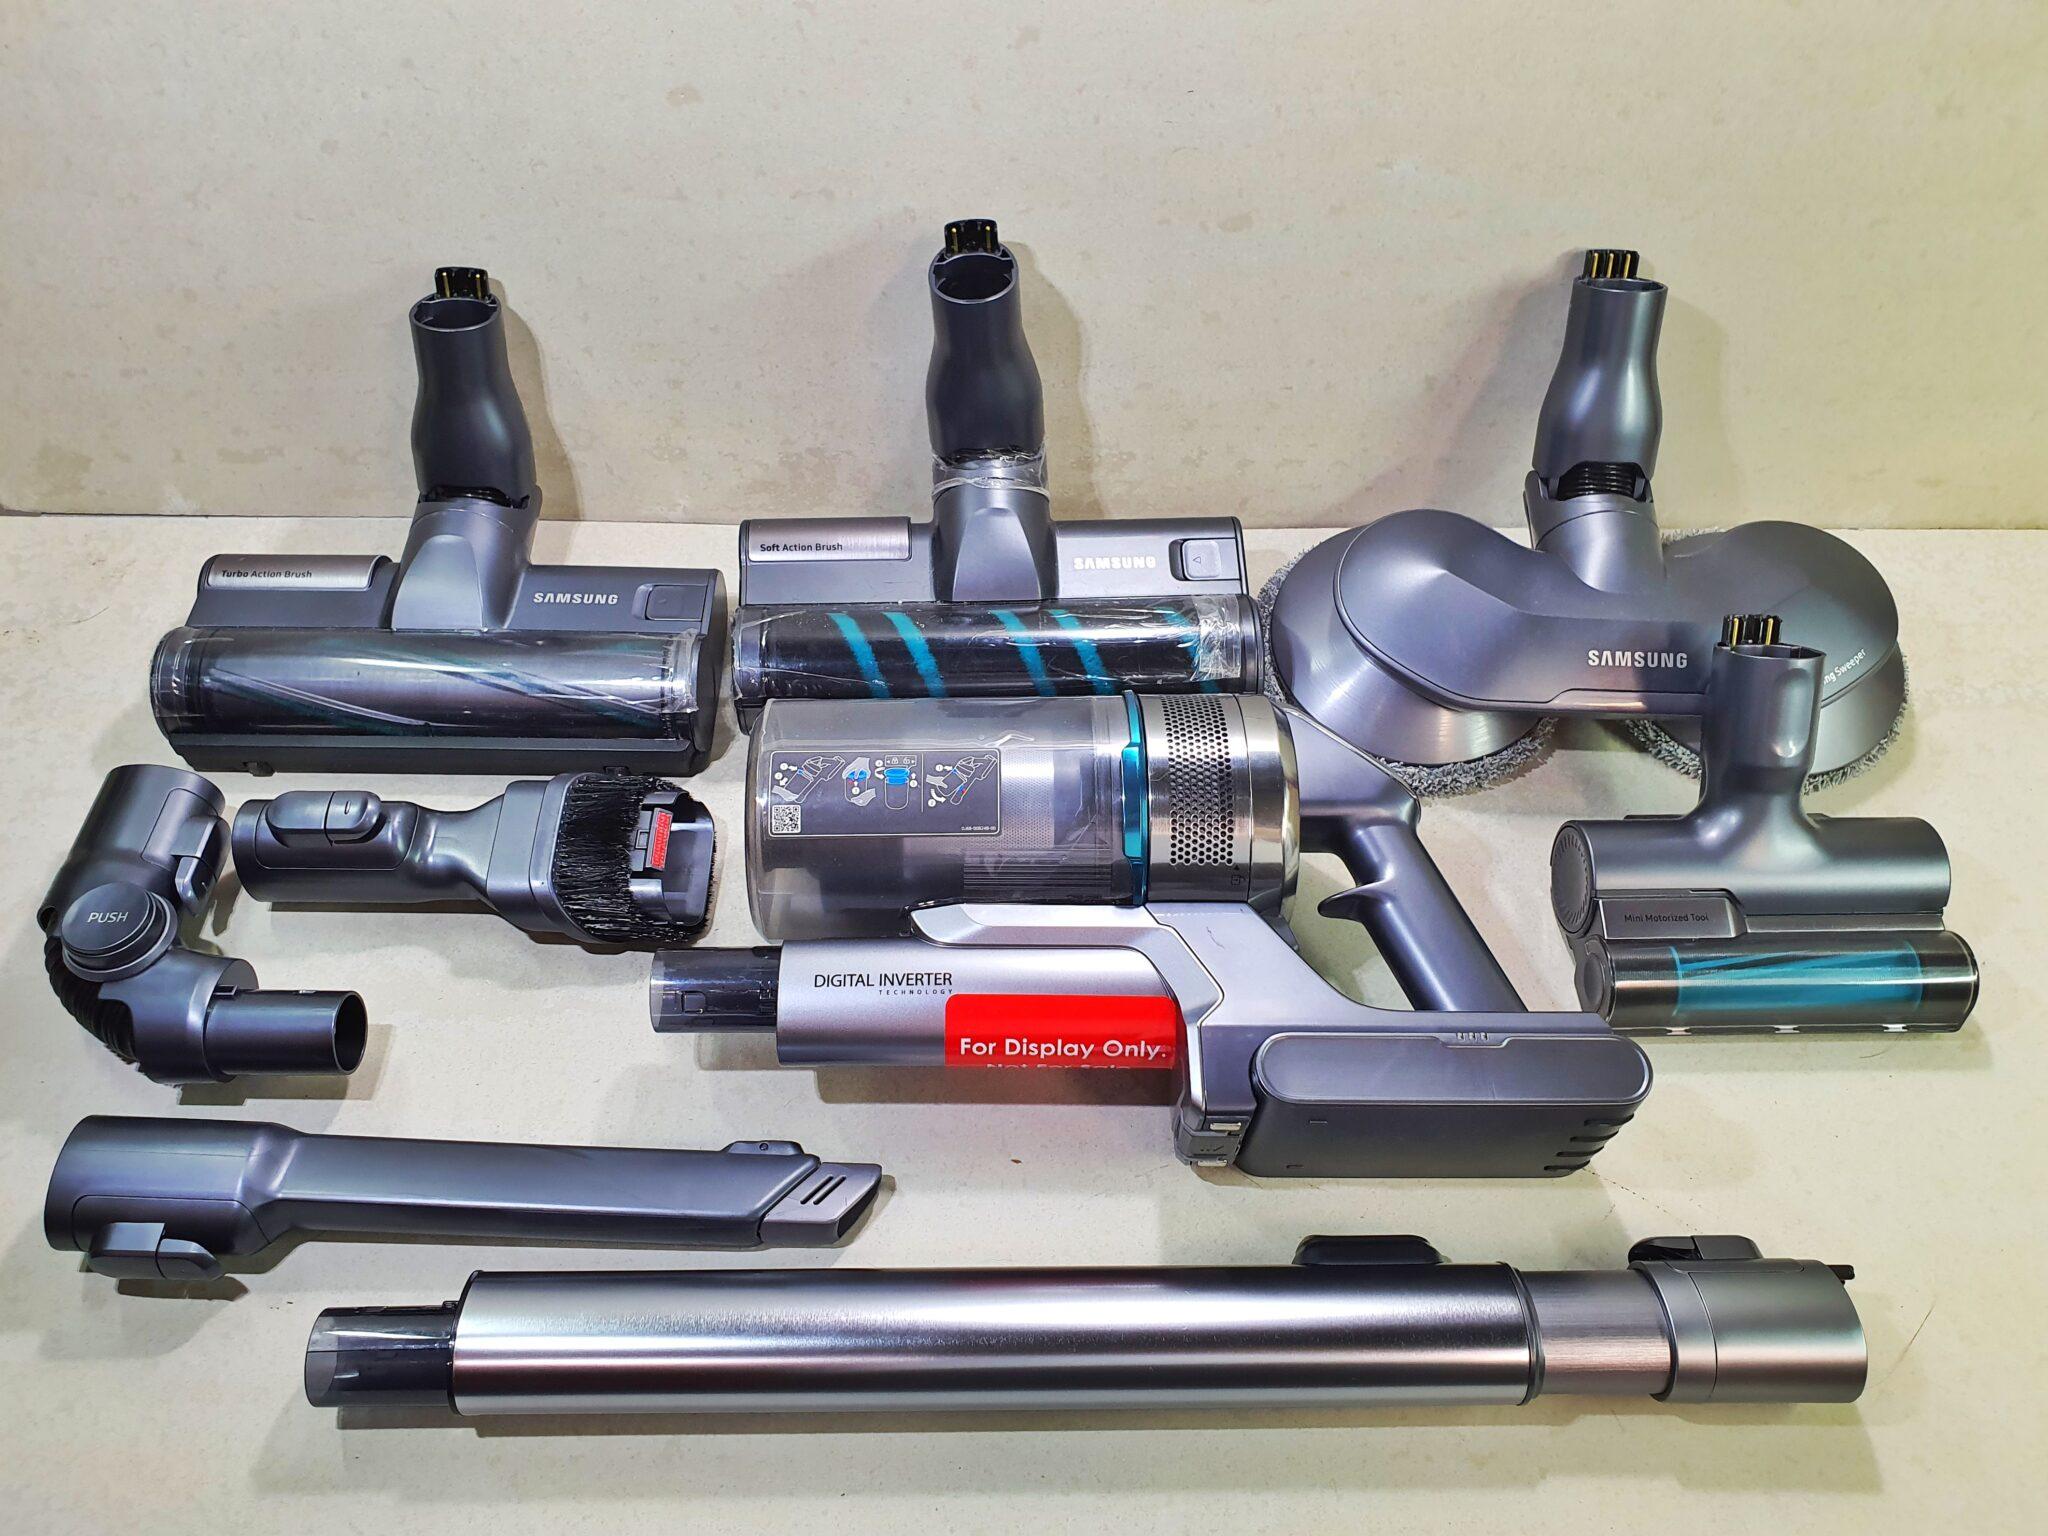 POWERstick Jet attachments all